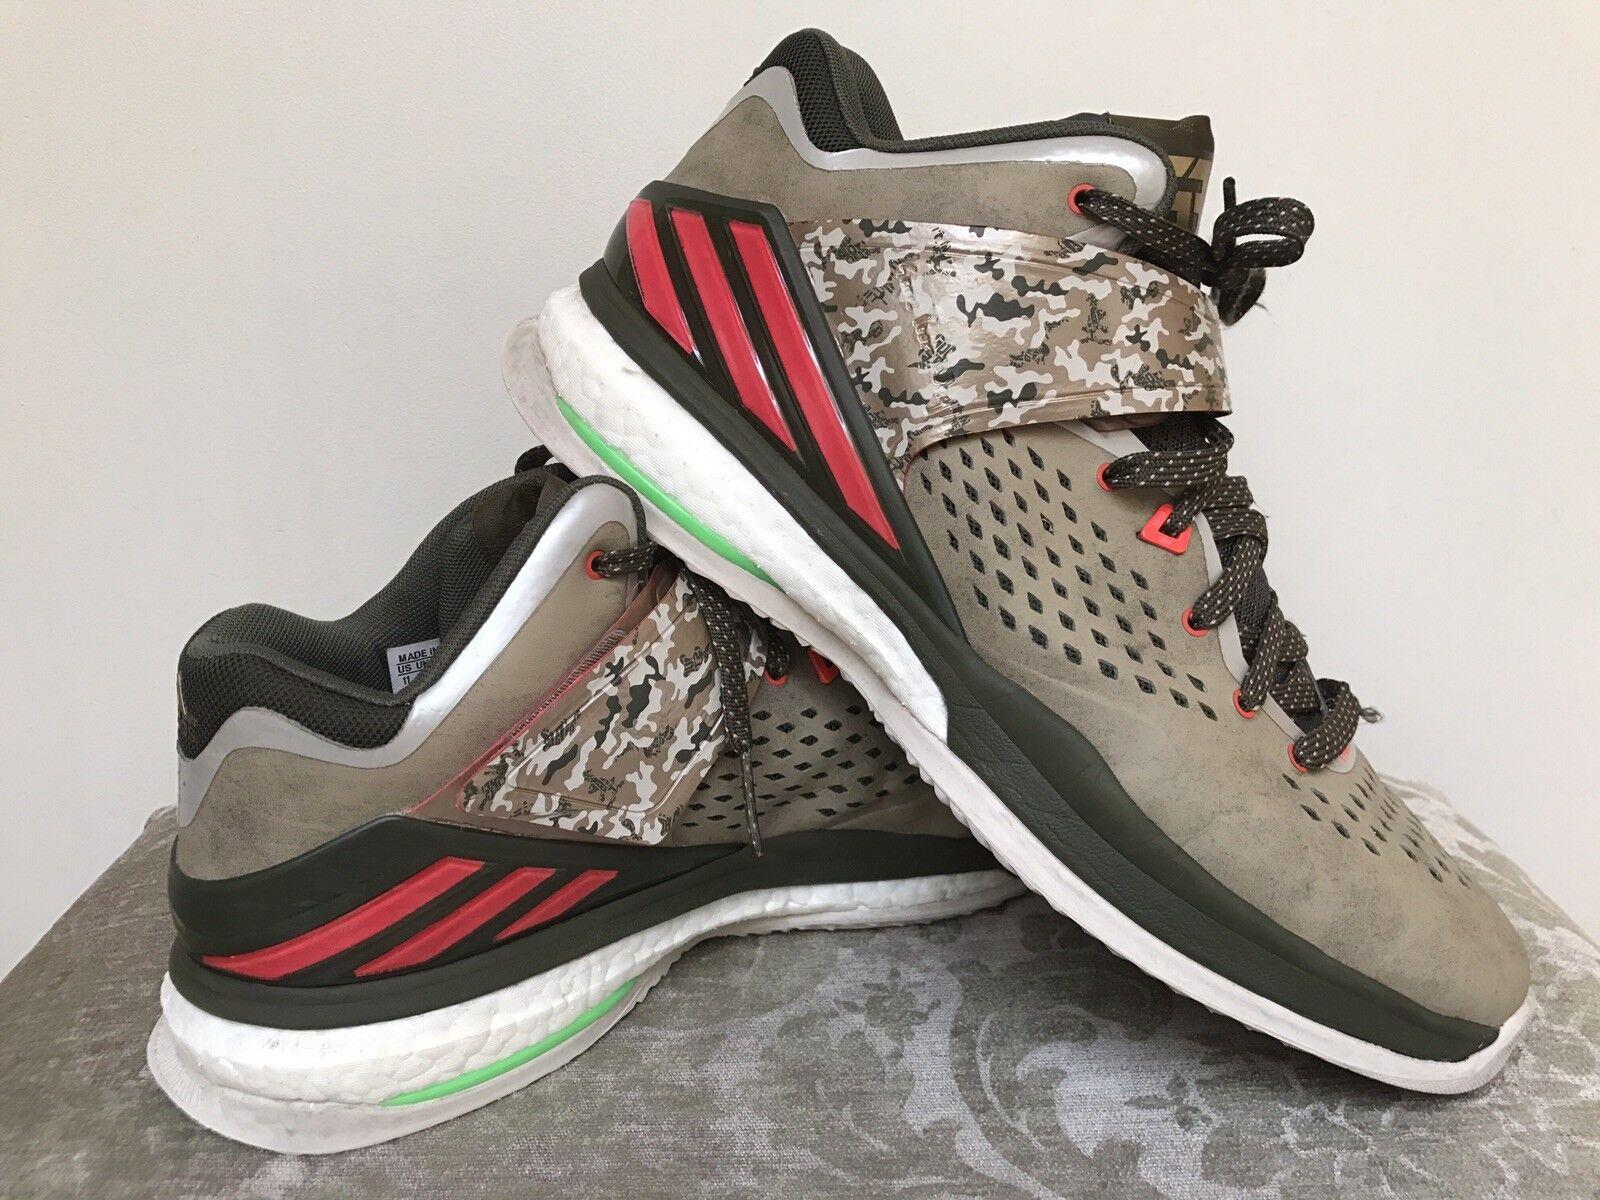 Robert Griffin III RG3 Energy Trainer Boost de Adidas para hombre Calzado Camo Tamaño EE.